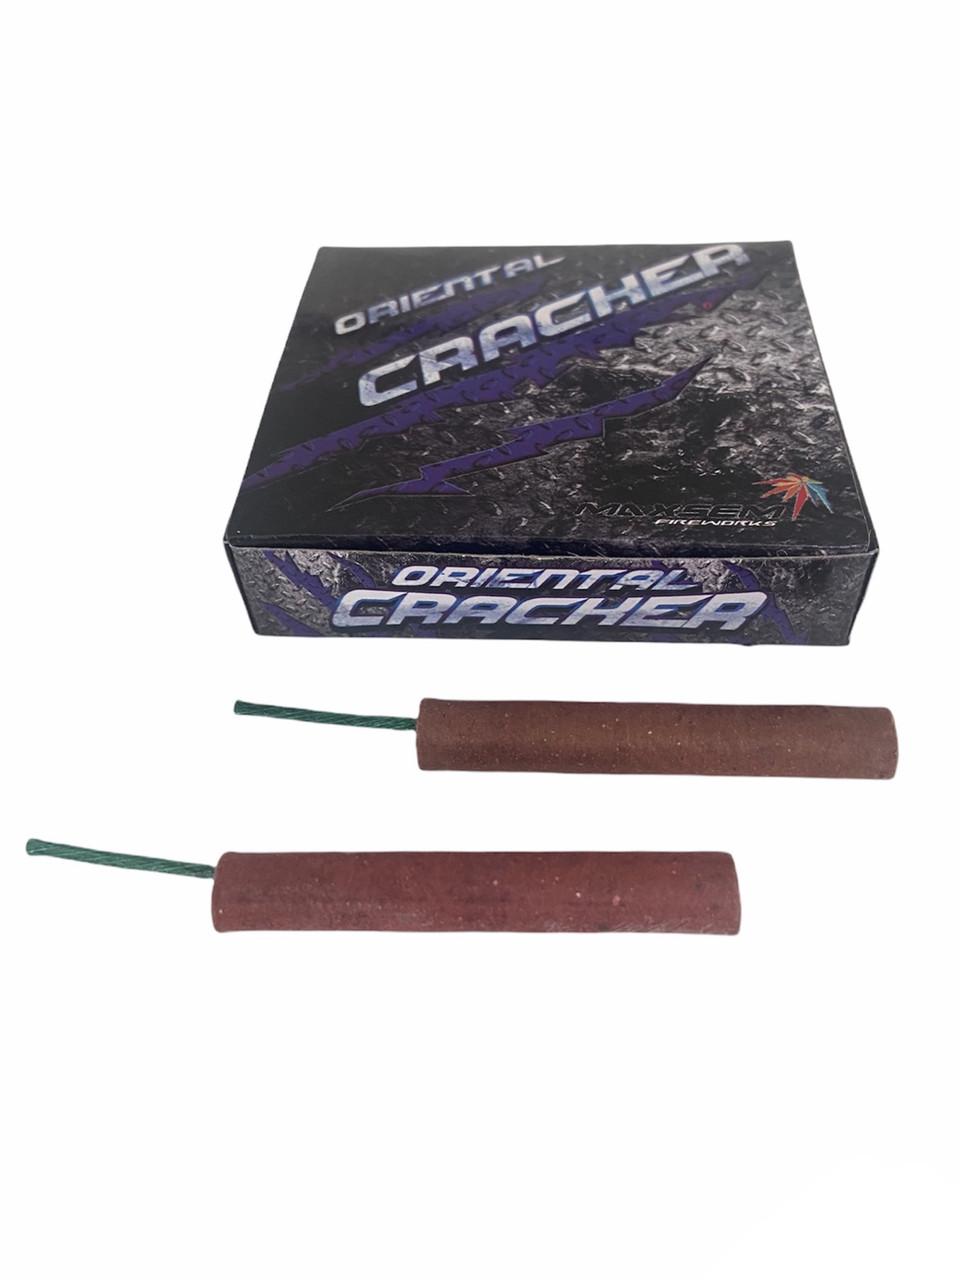 Петарды Корсар 2 Oriental Cracher K0202 Maxsem 16 шт/уп